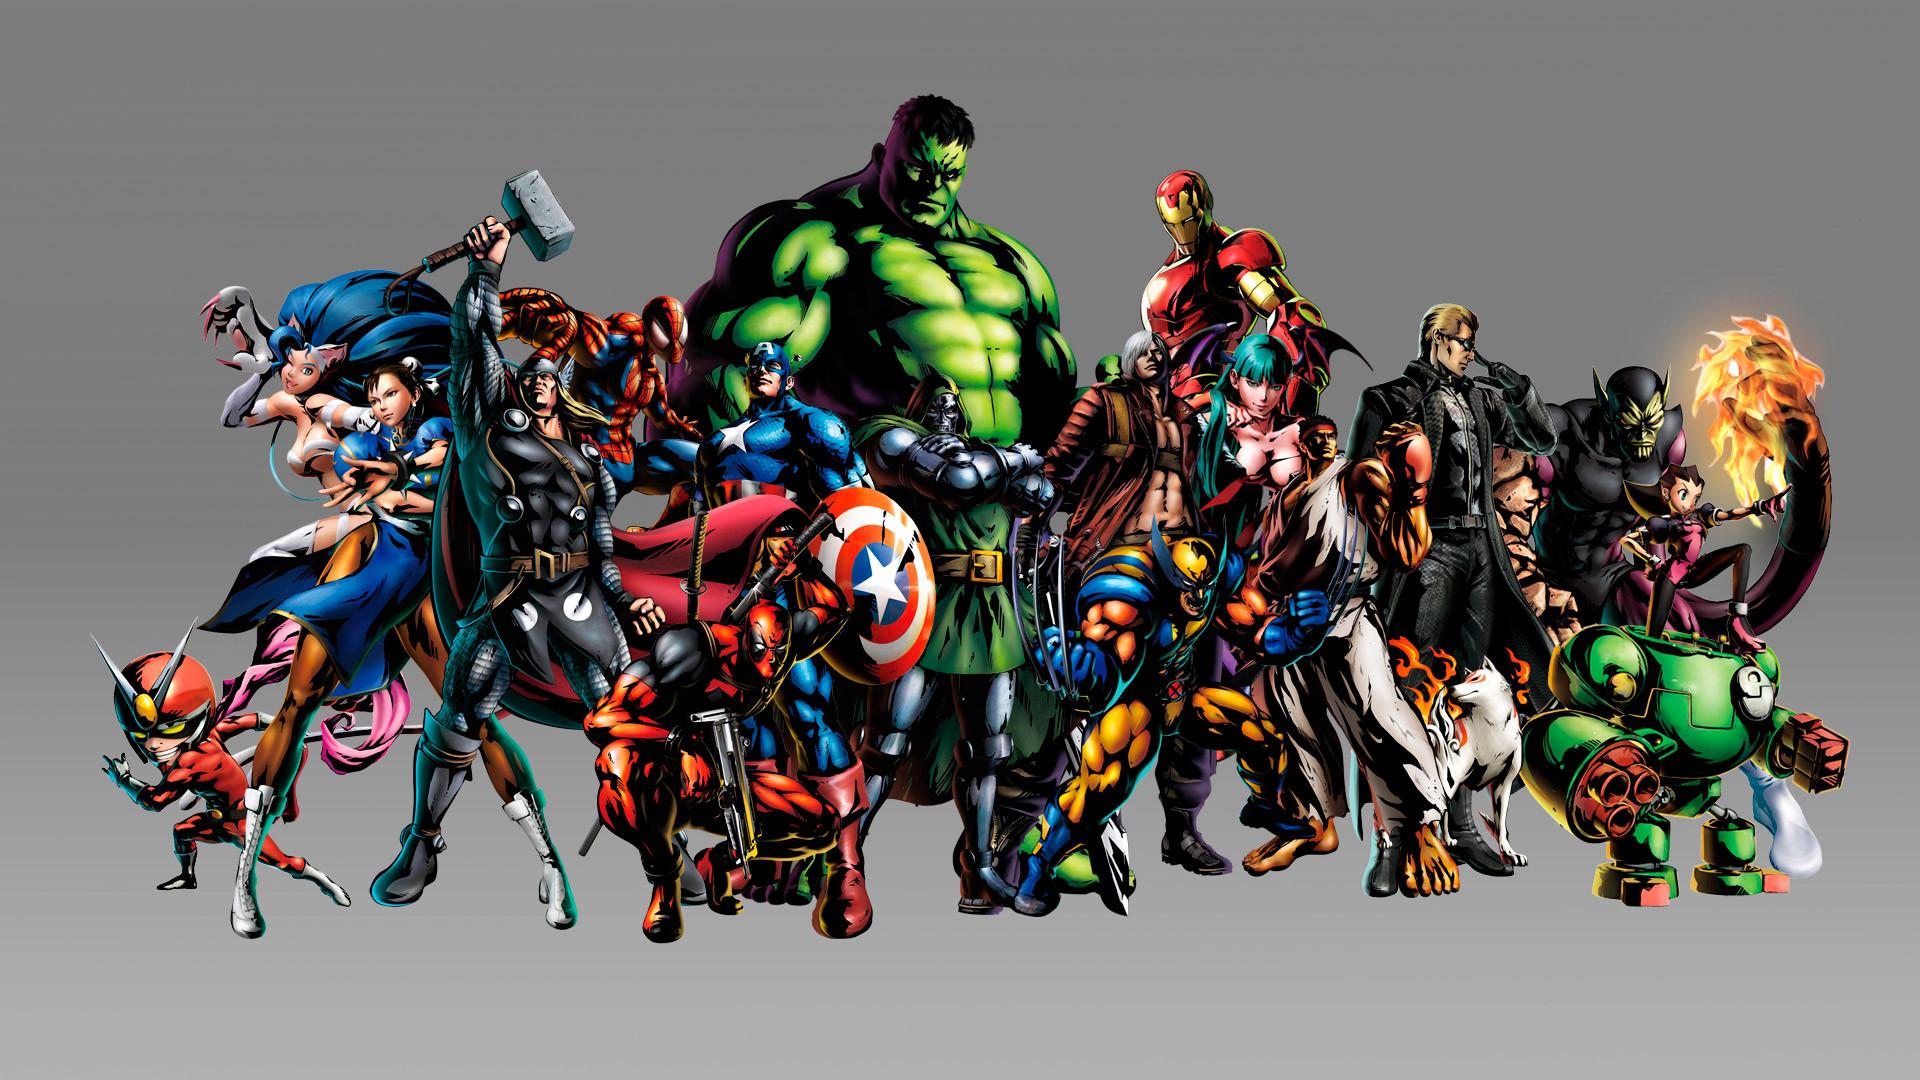 Res: 1920x1080, Marvel Wallpapers HD PixelsTalk Captain Marvel HD Wallpapers Backgrounds  Wallpaper